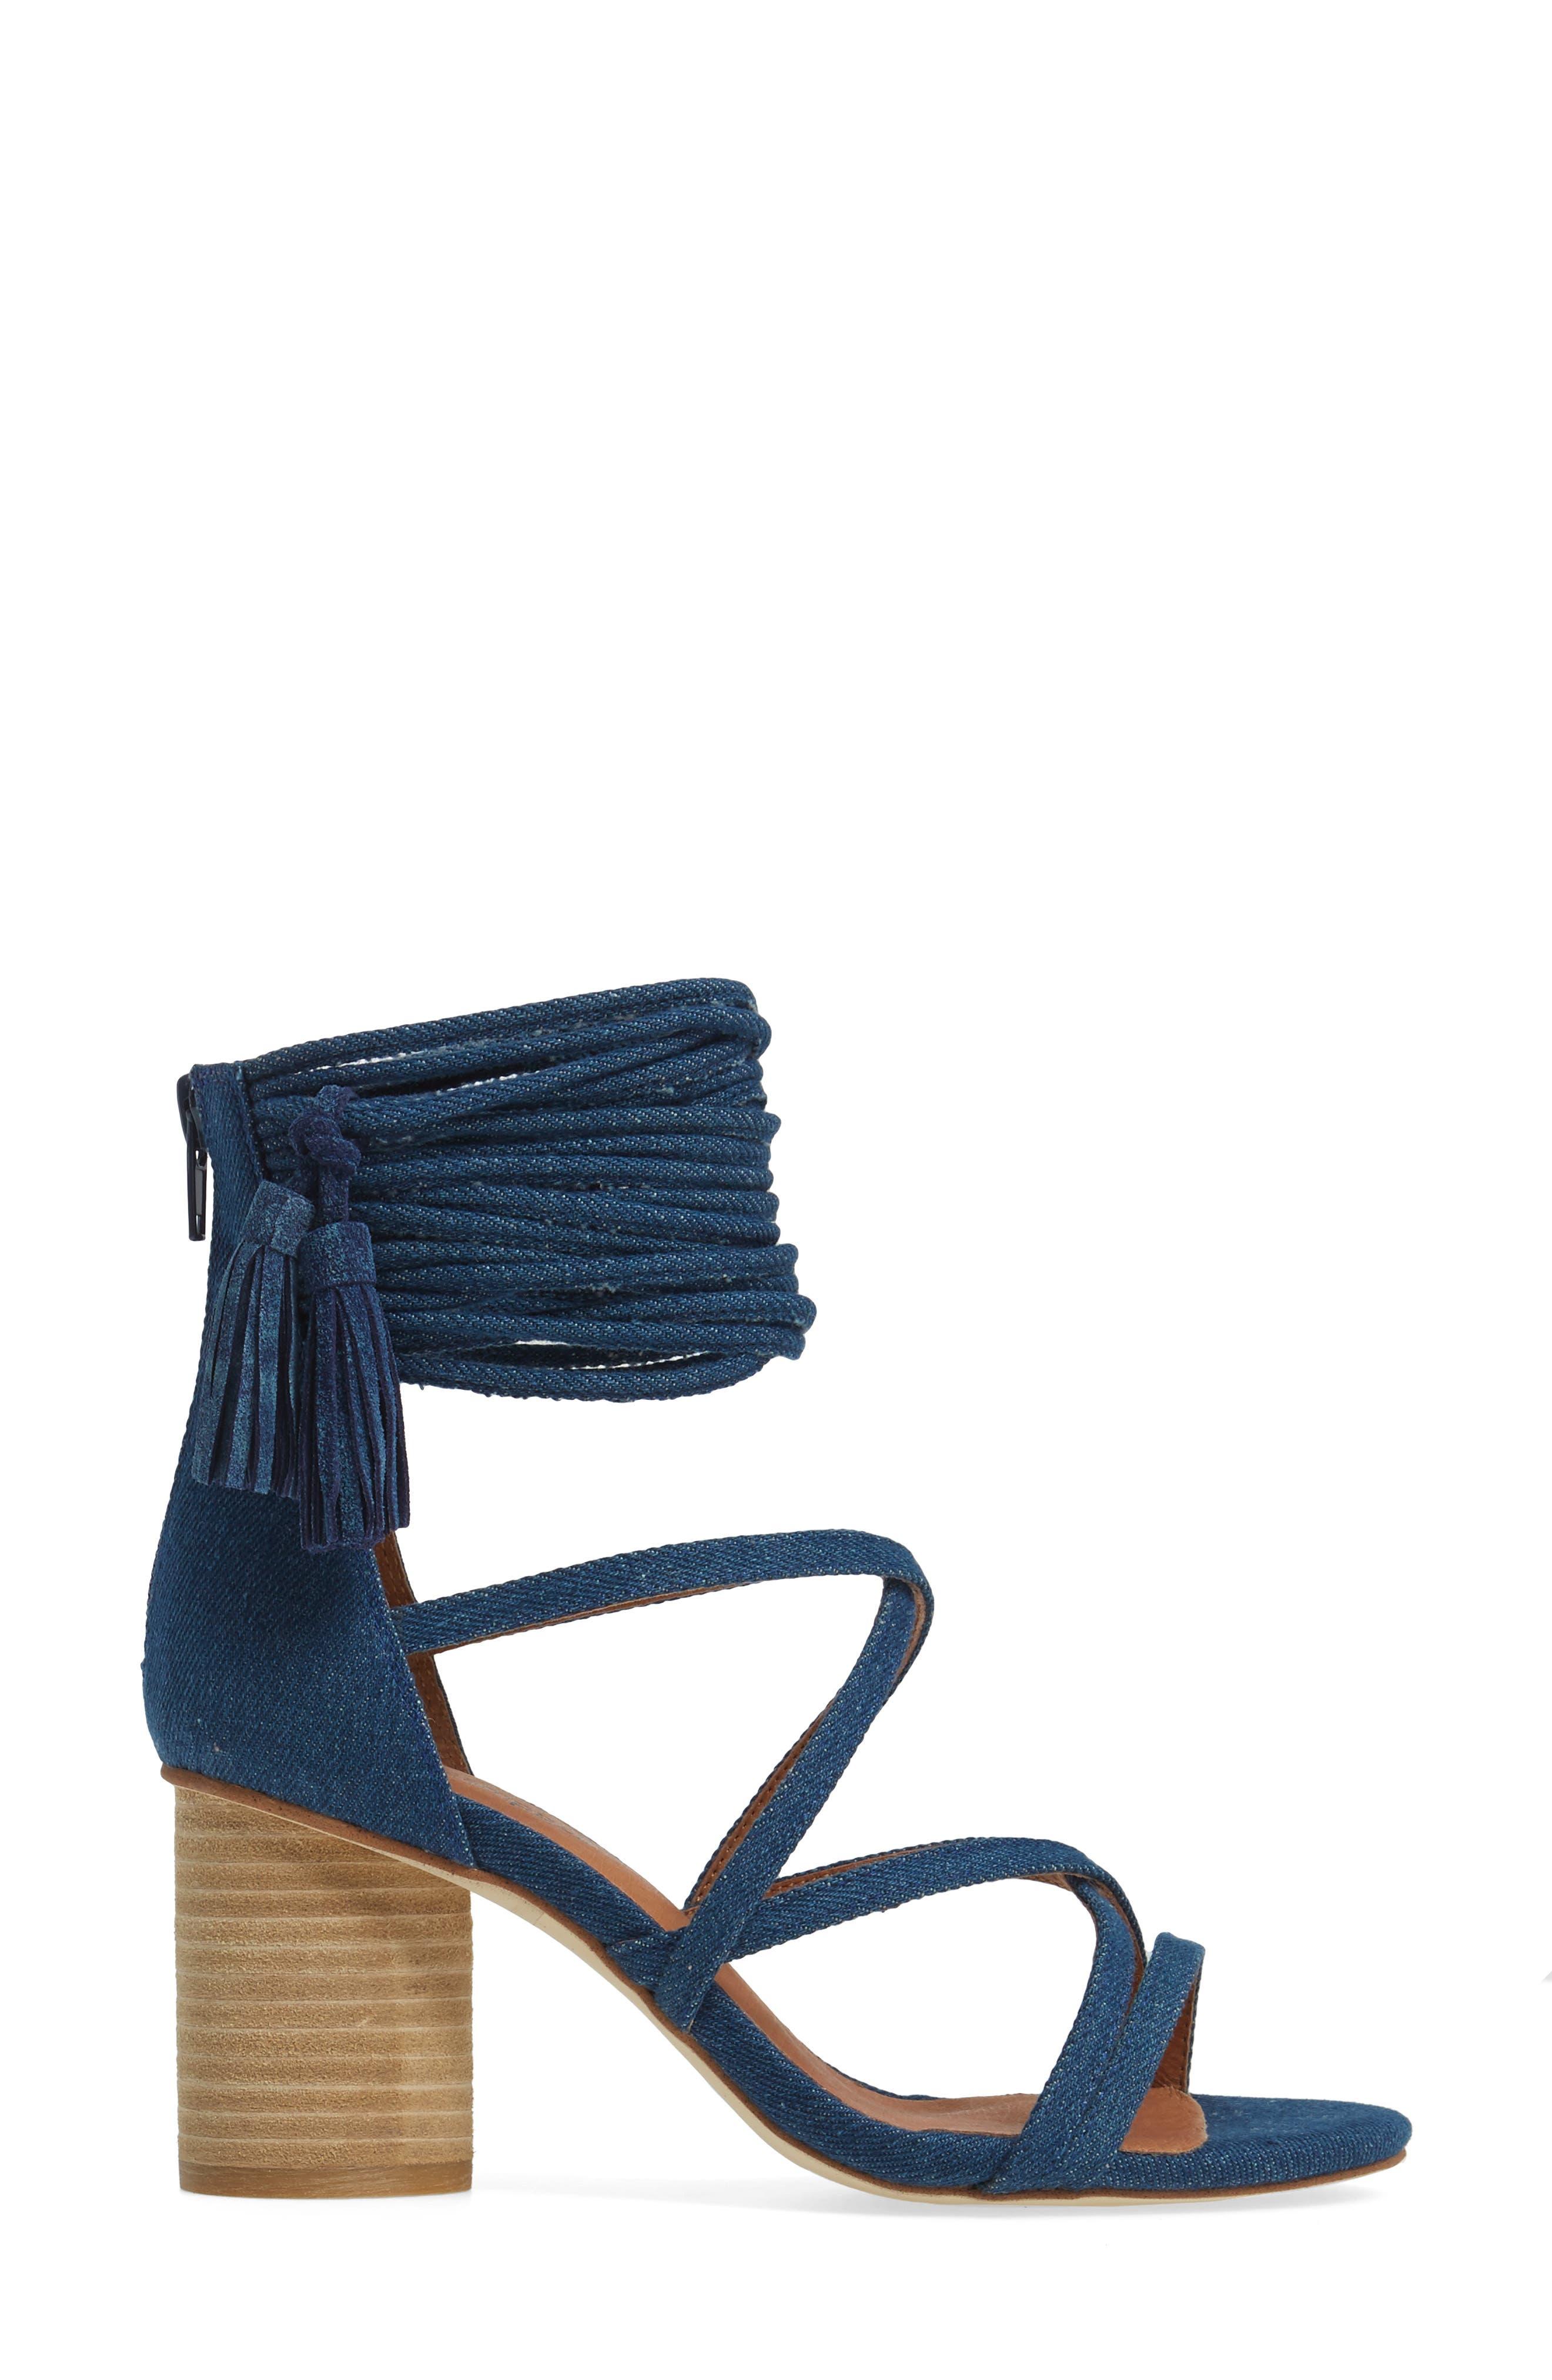 'Despina' Strappy Sandal,                             Alternate thumbnail 20, color,